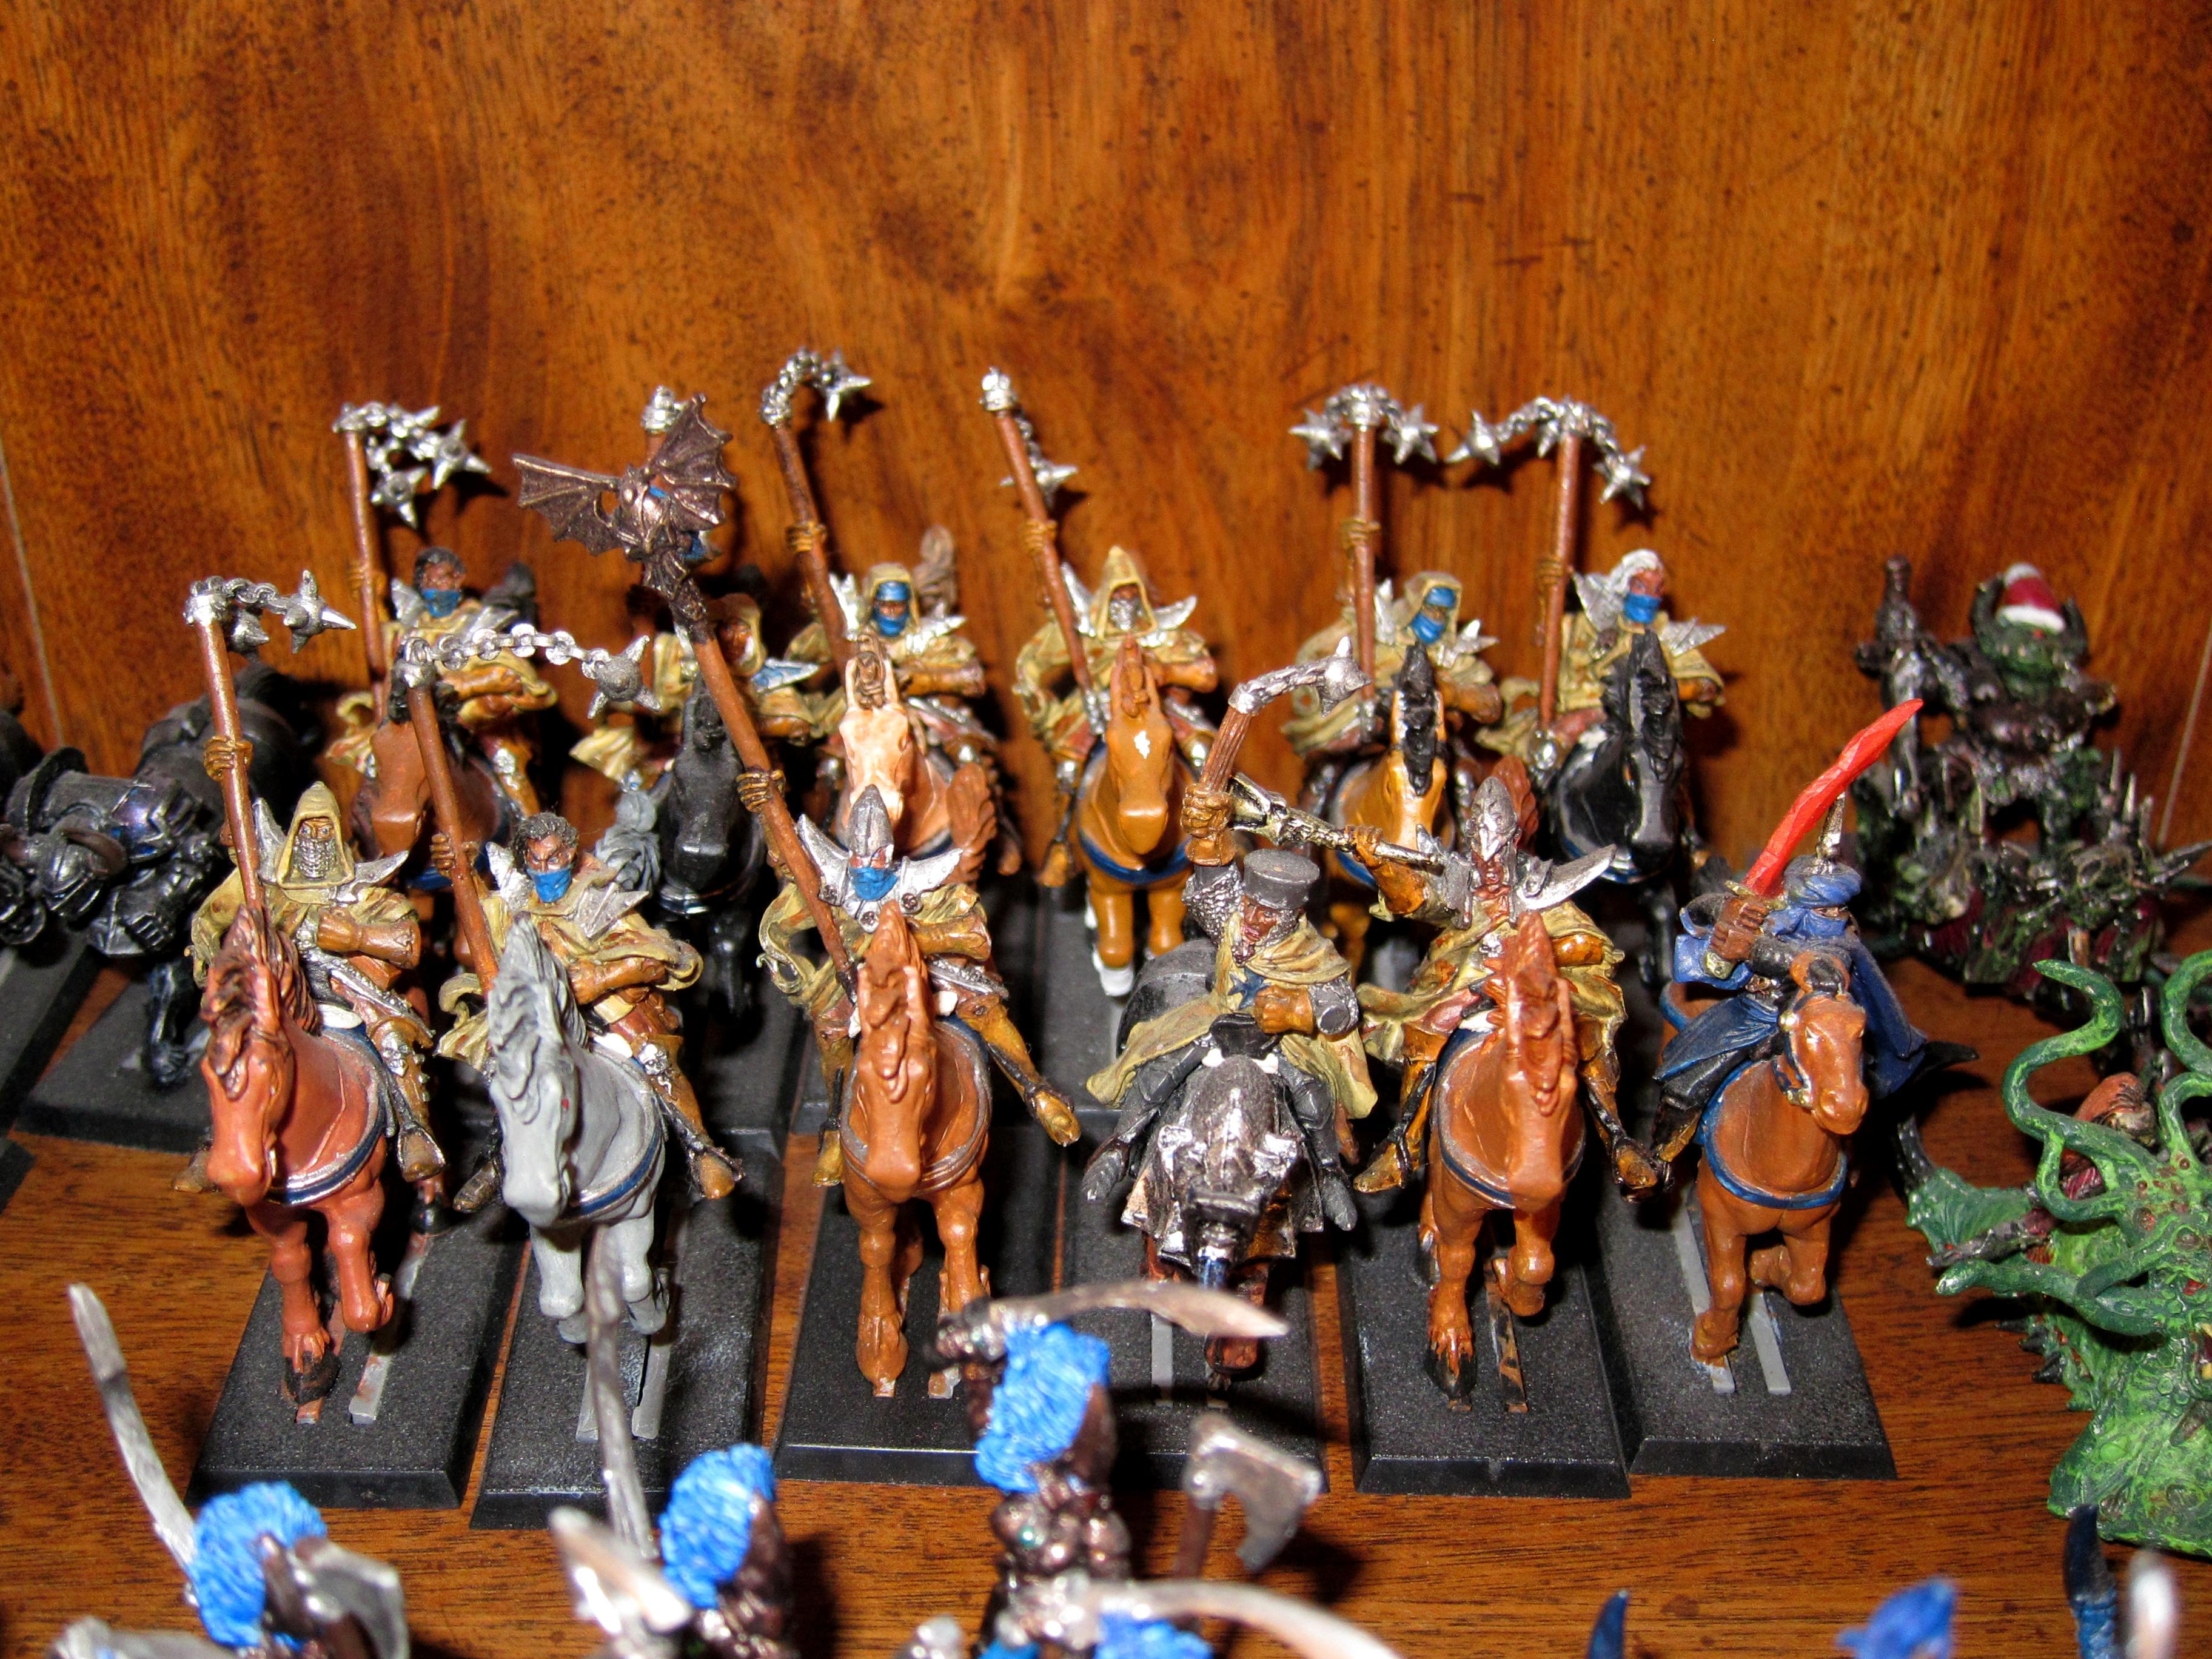 Marauders, Woc, Chaos Mounted Marauders